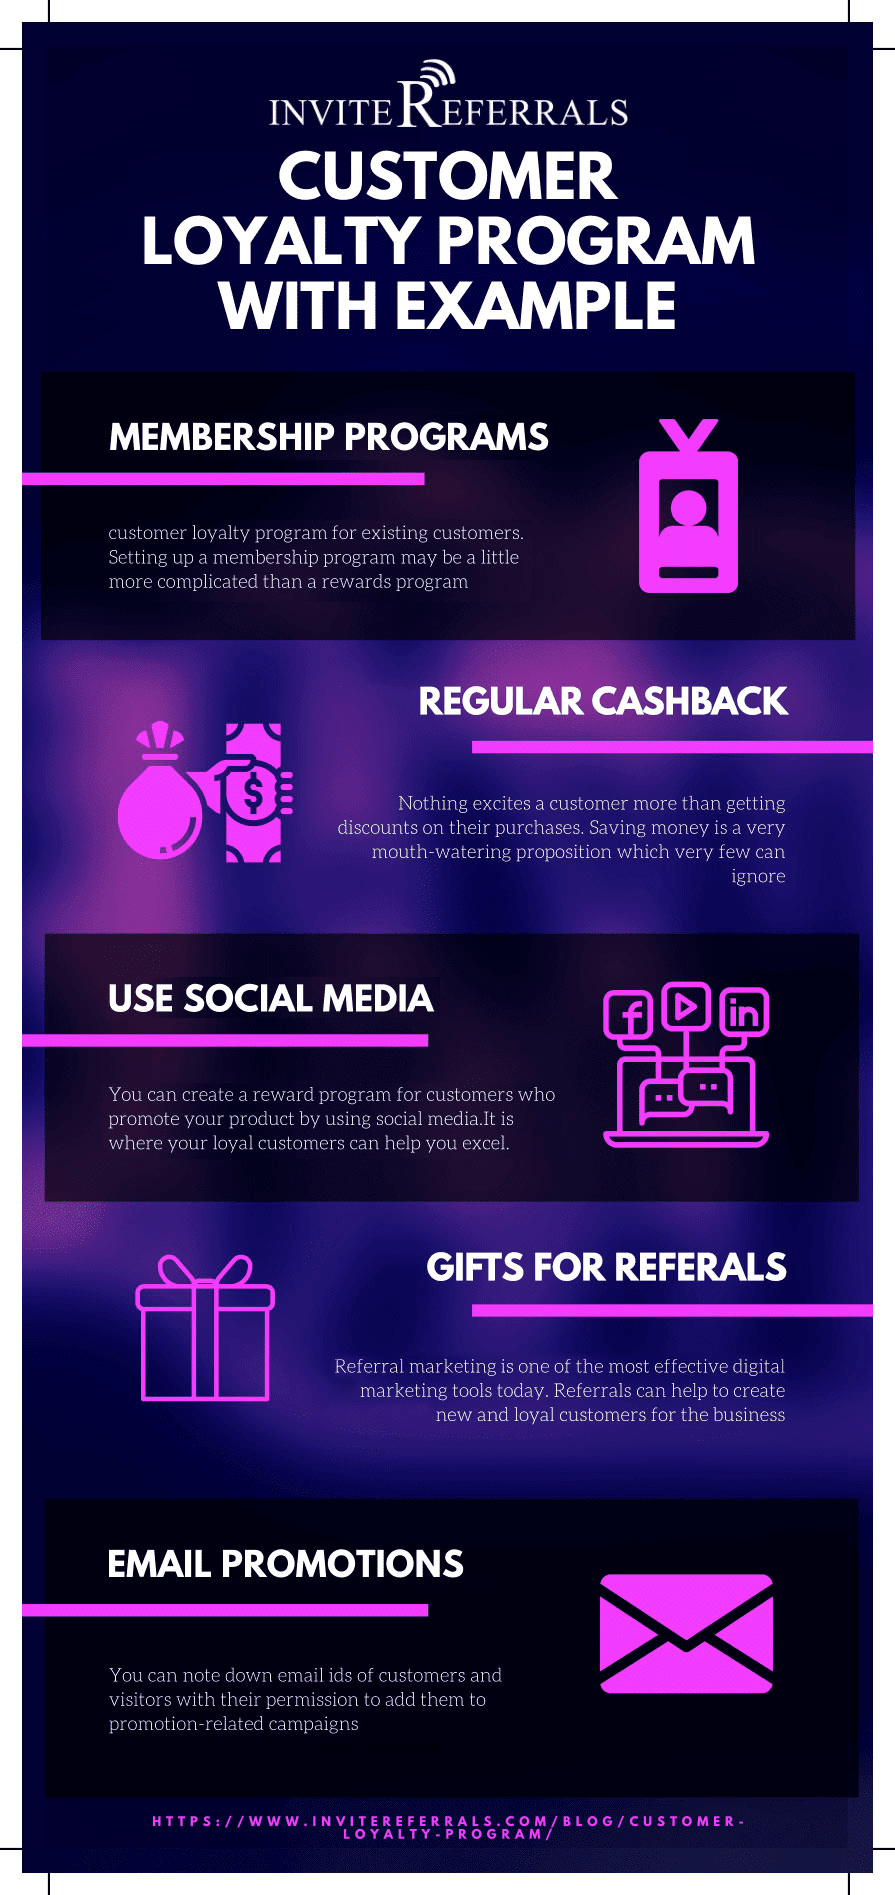 Customer Loyalty Program infographic